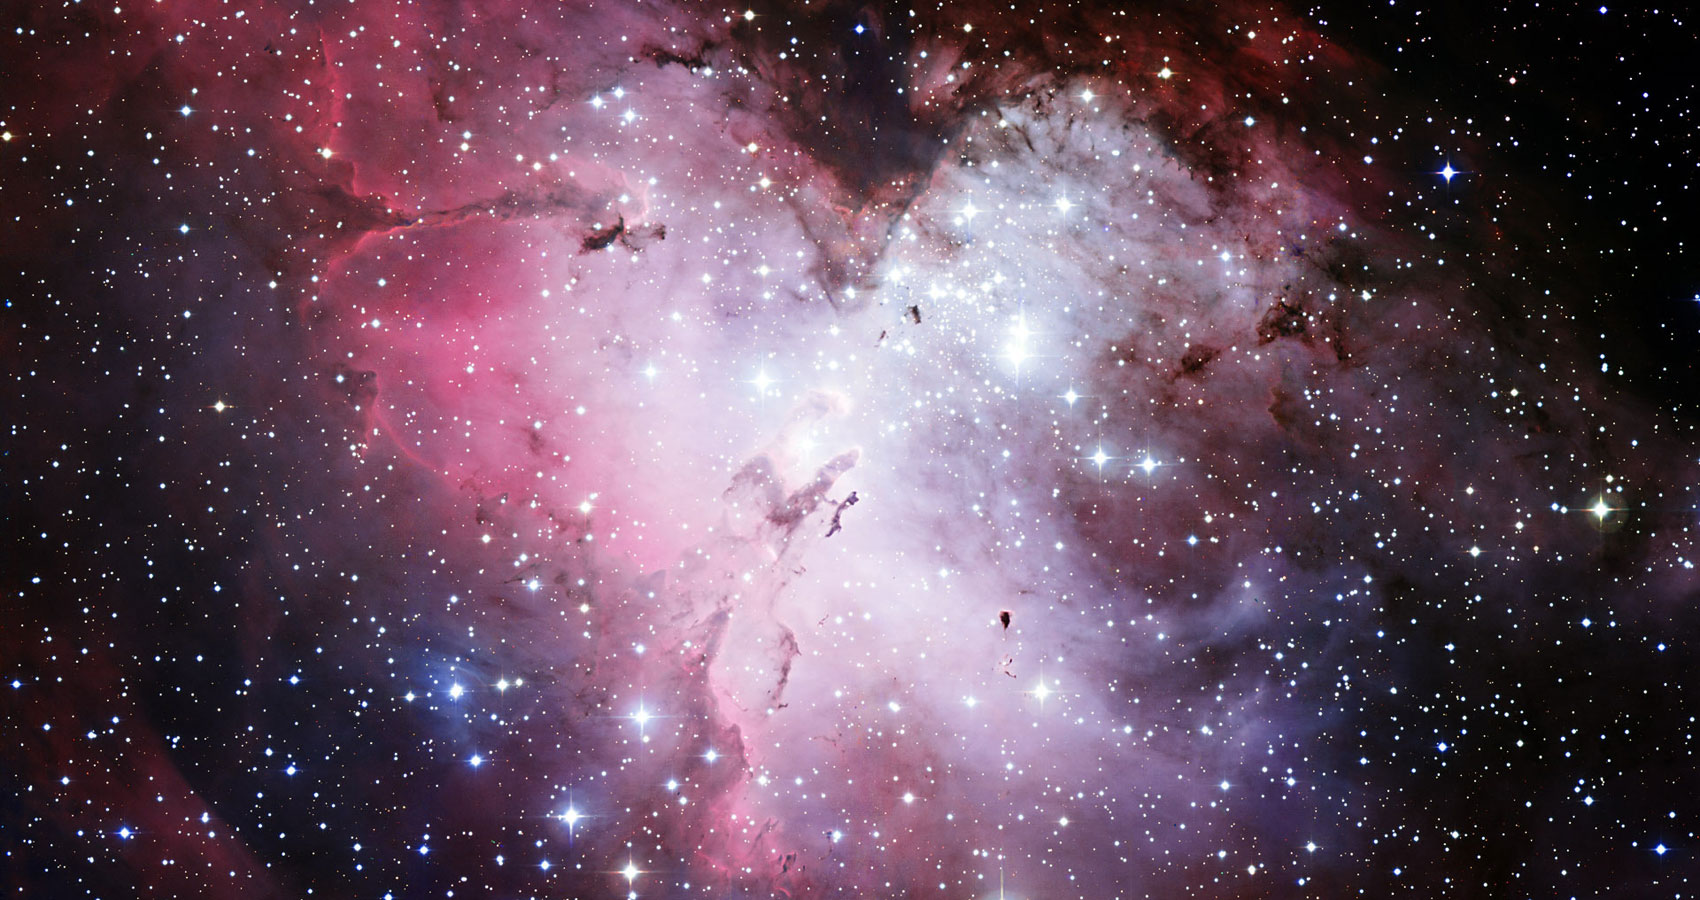 Love by Odonko-ba at Spillwords.com